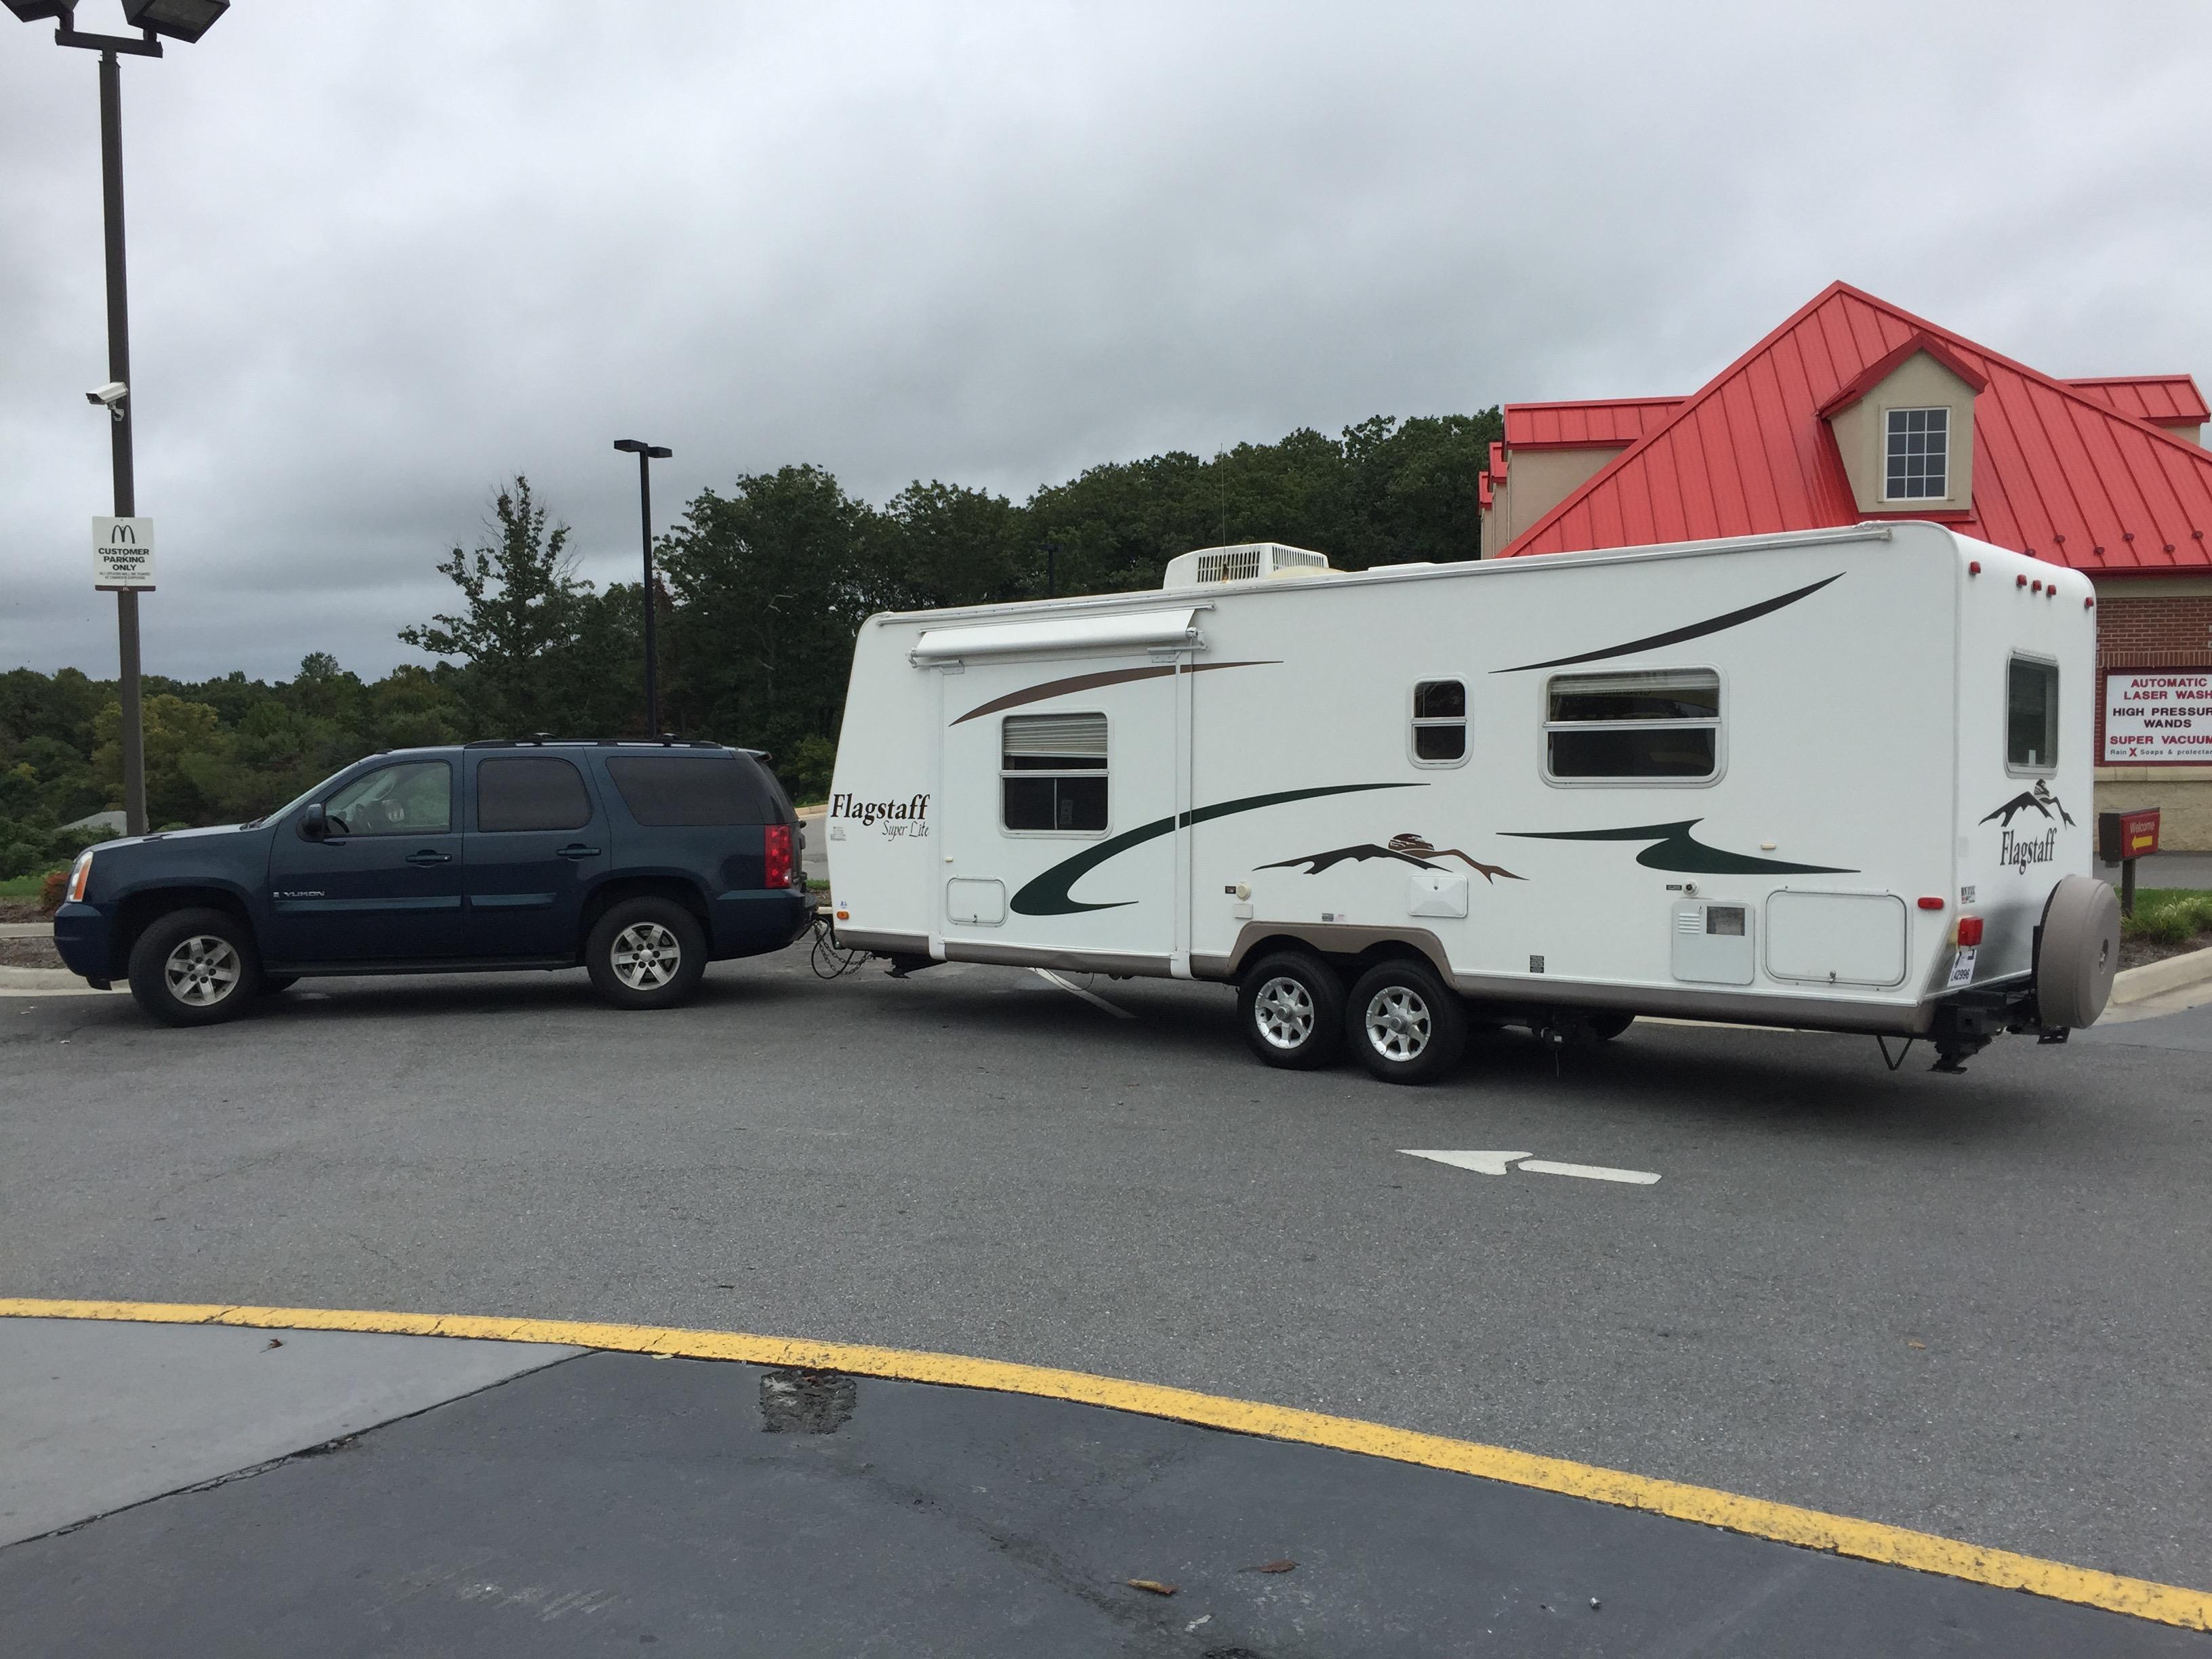 The trailer trail